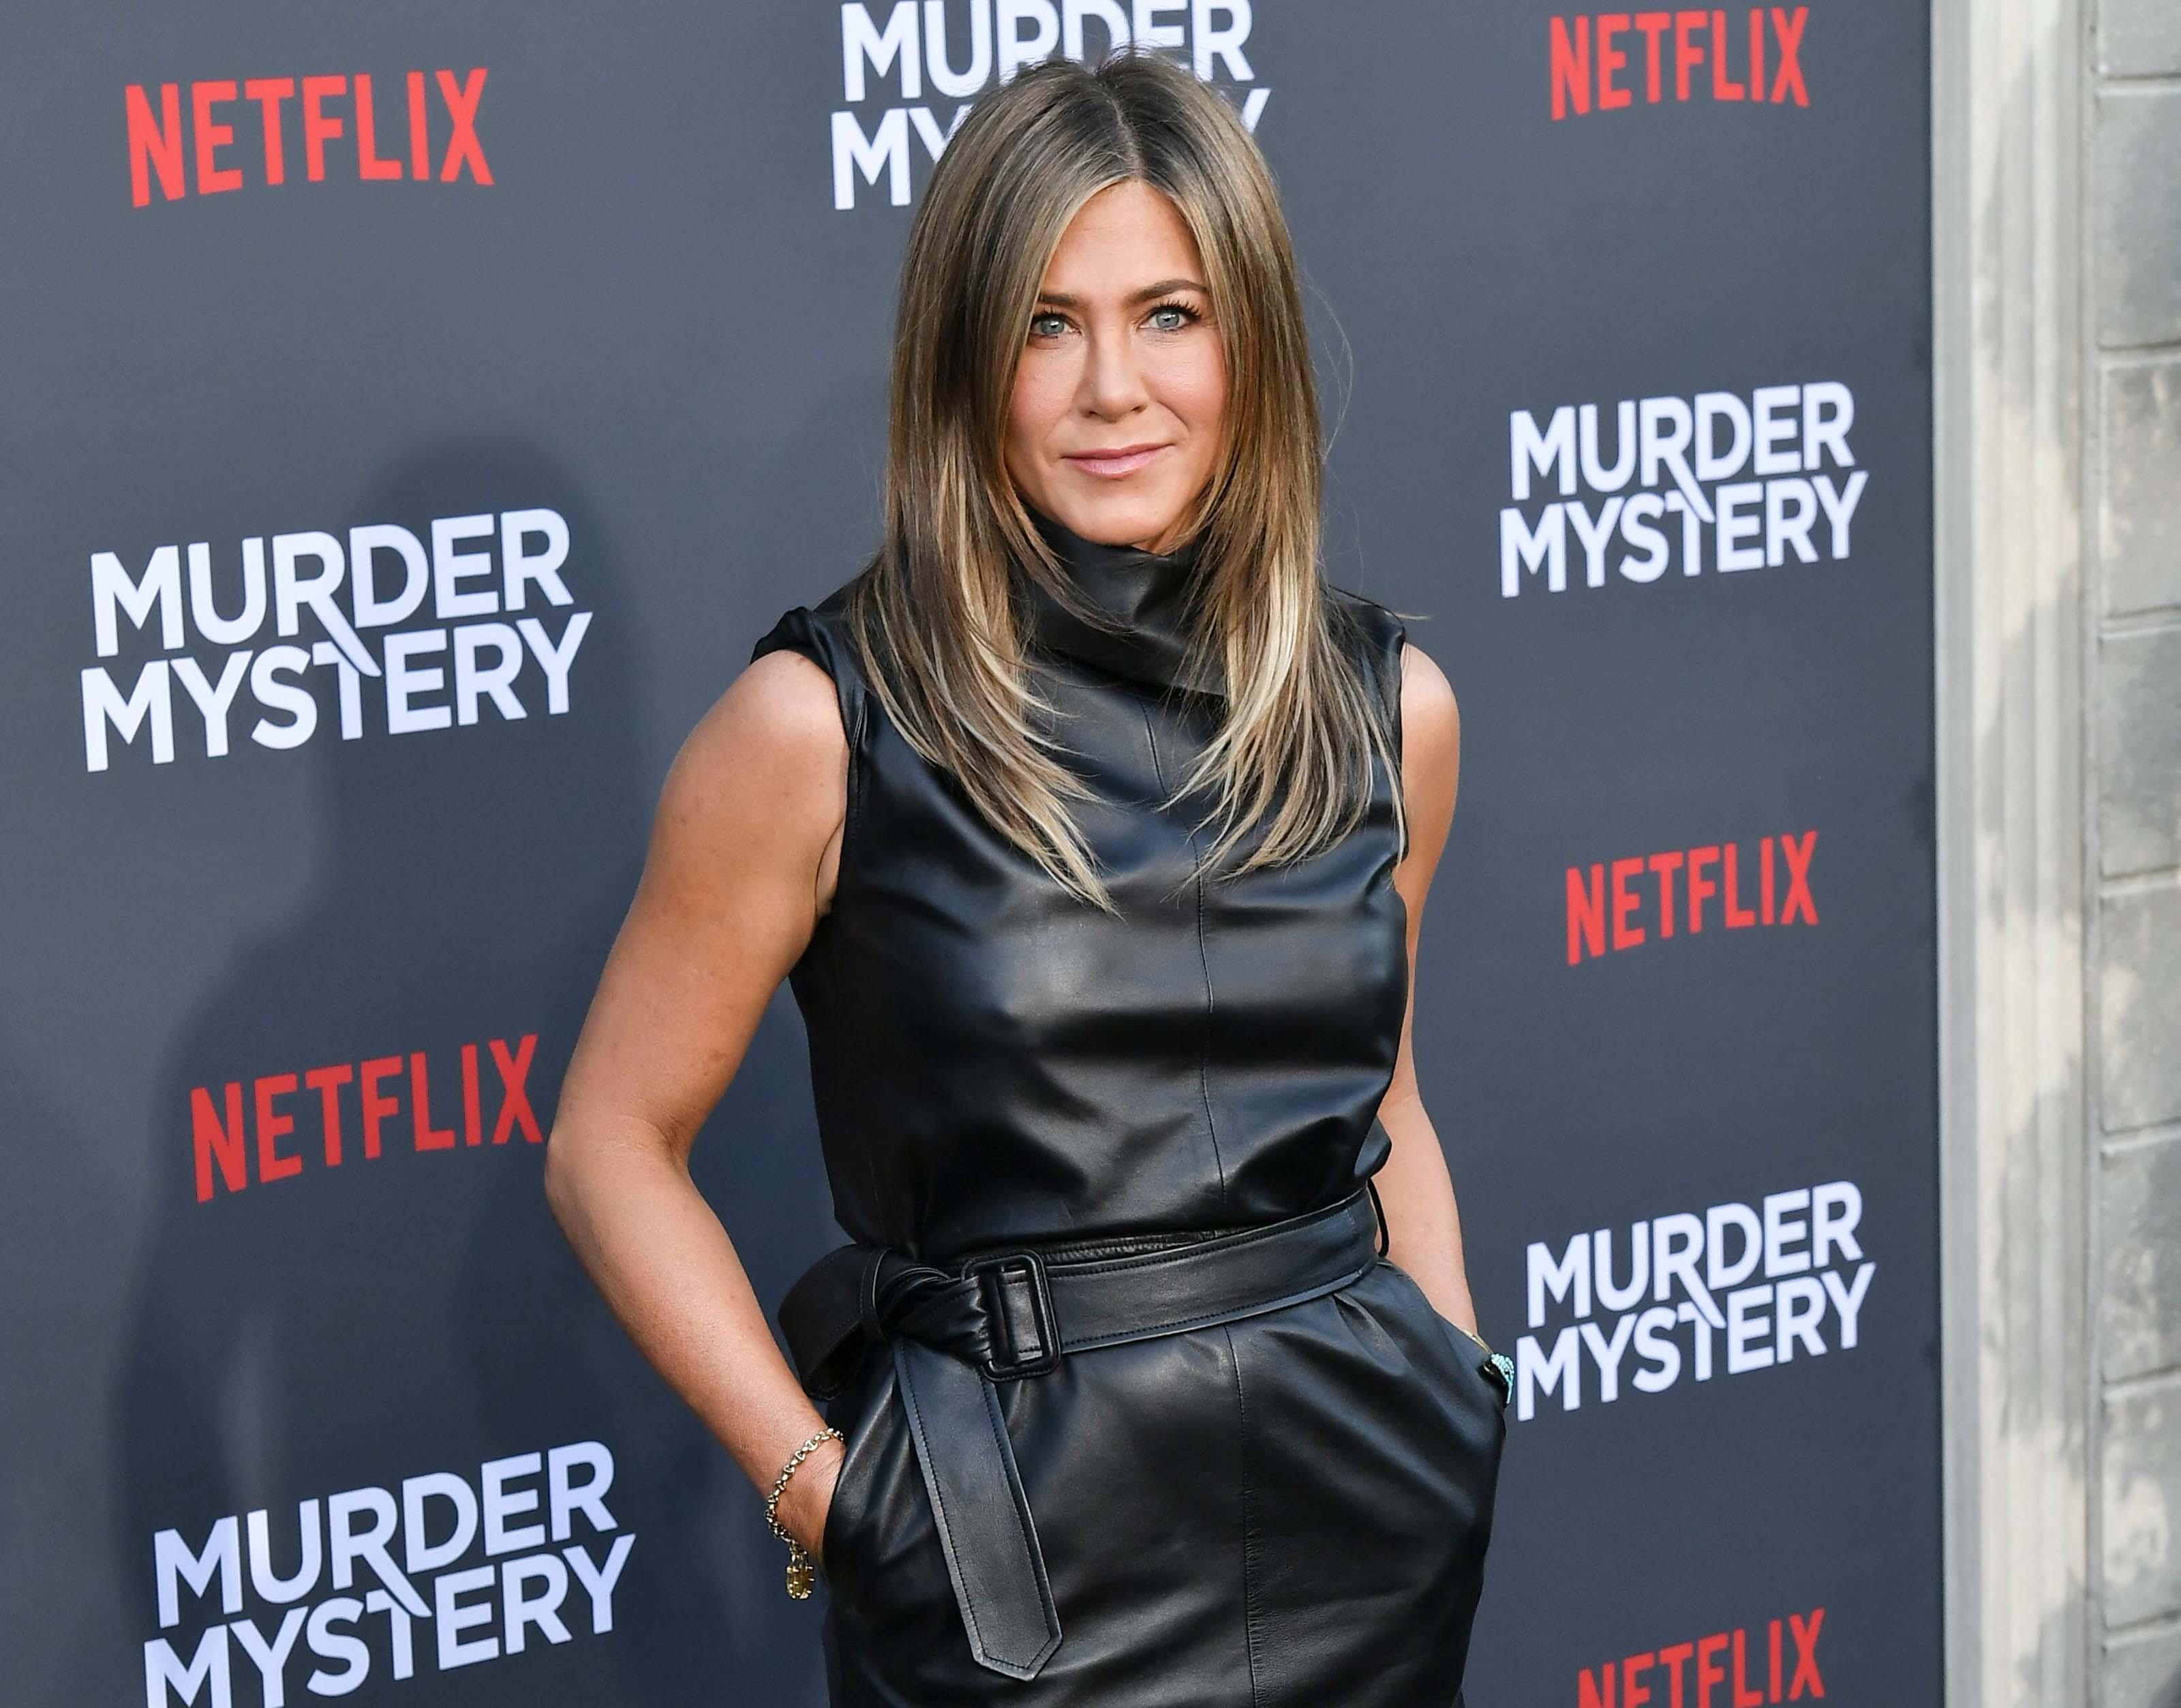 Jennifer Aniston attends Film Premiere Murder Mystery